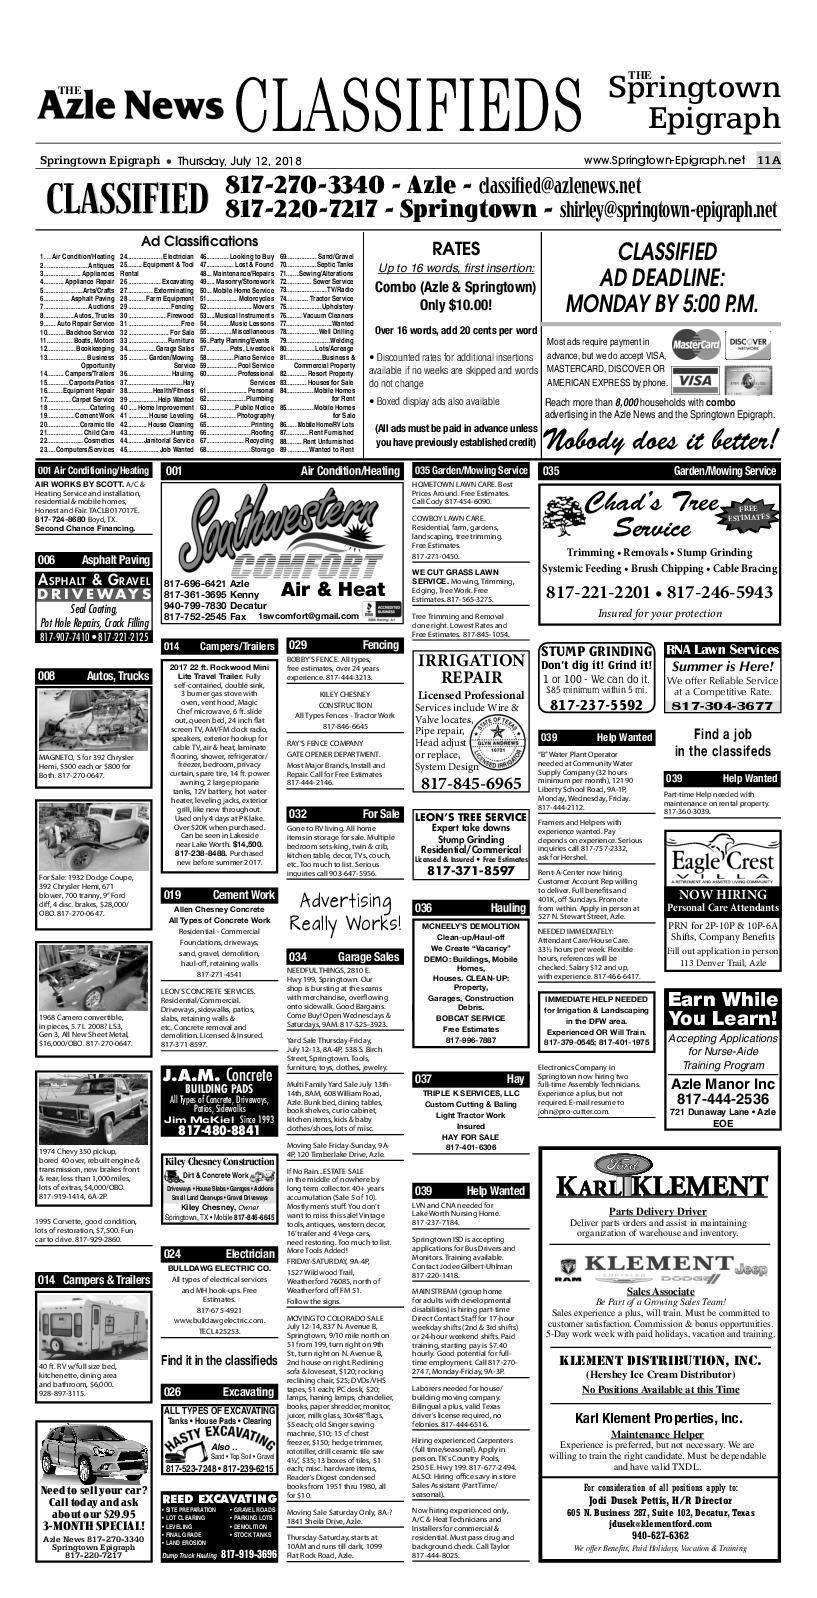 Springtown classifieds